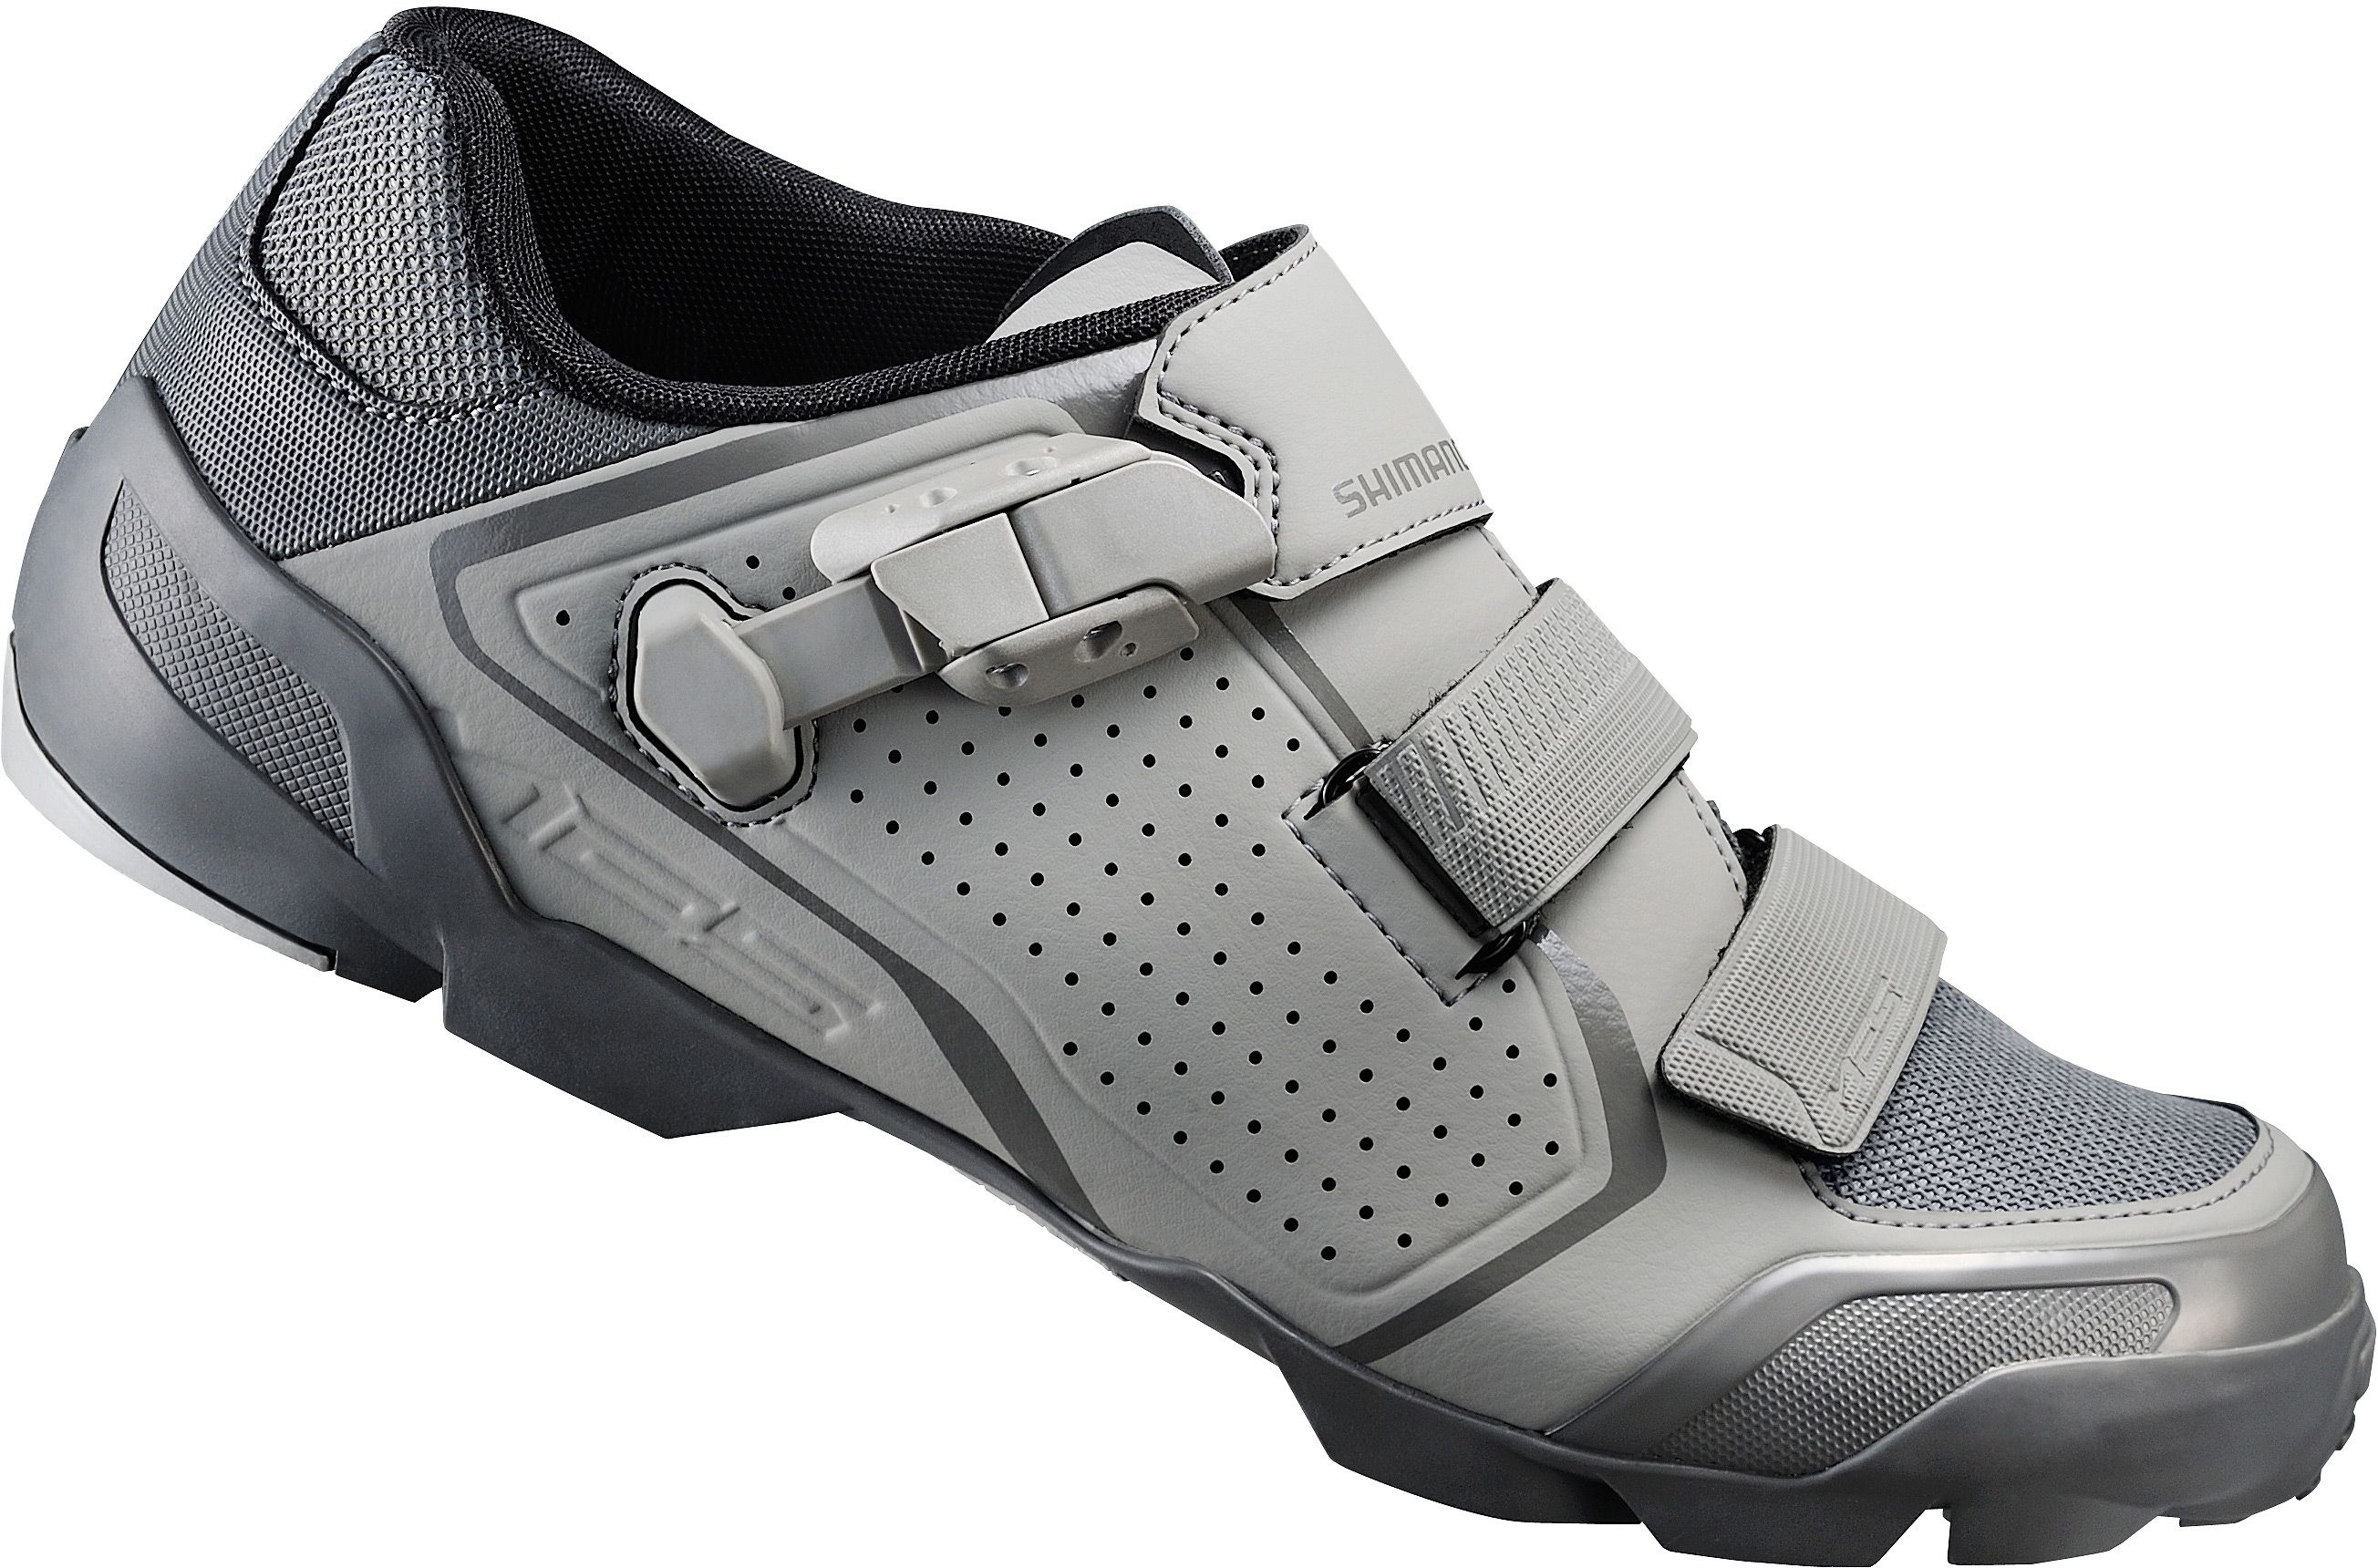 Shimano Me5 Spd Mtb Shoes | Sko